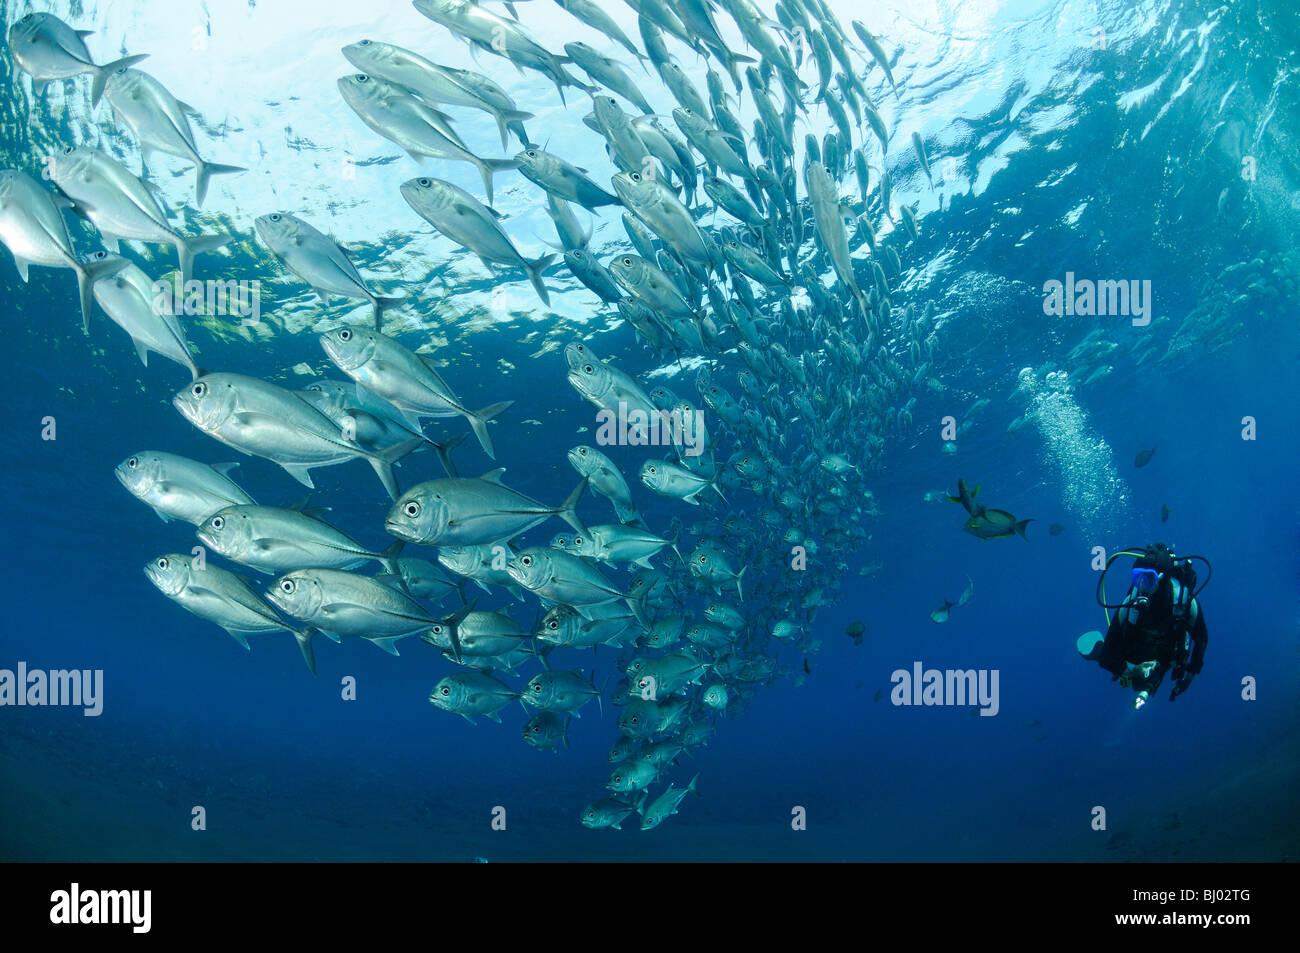 Caranx sexfasciatus, Bigeye trevally, school of bigeye trevallys, school of fishes, scuba diver, Tulamben, Liberty - Stock Image